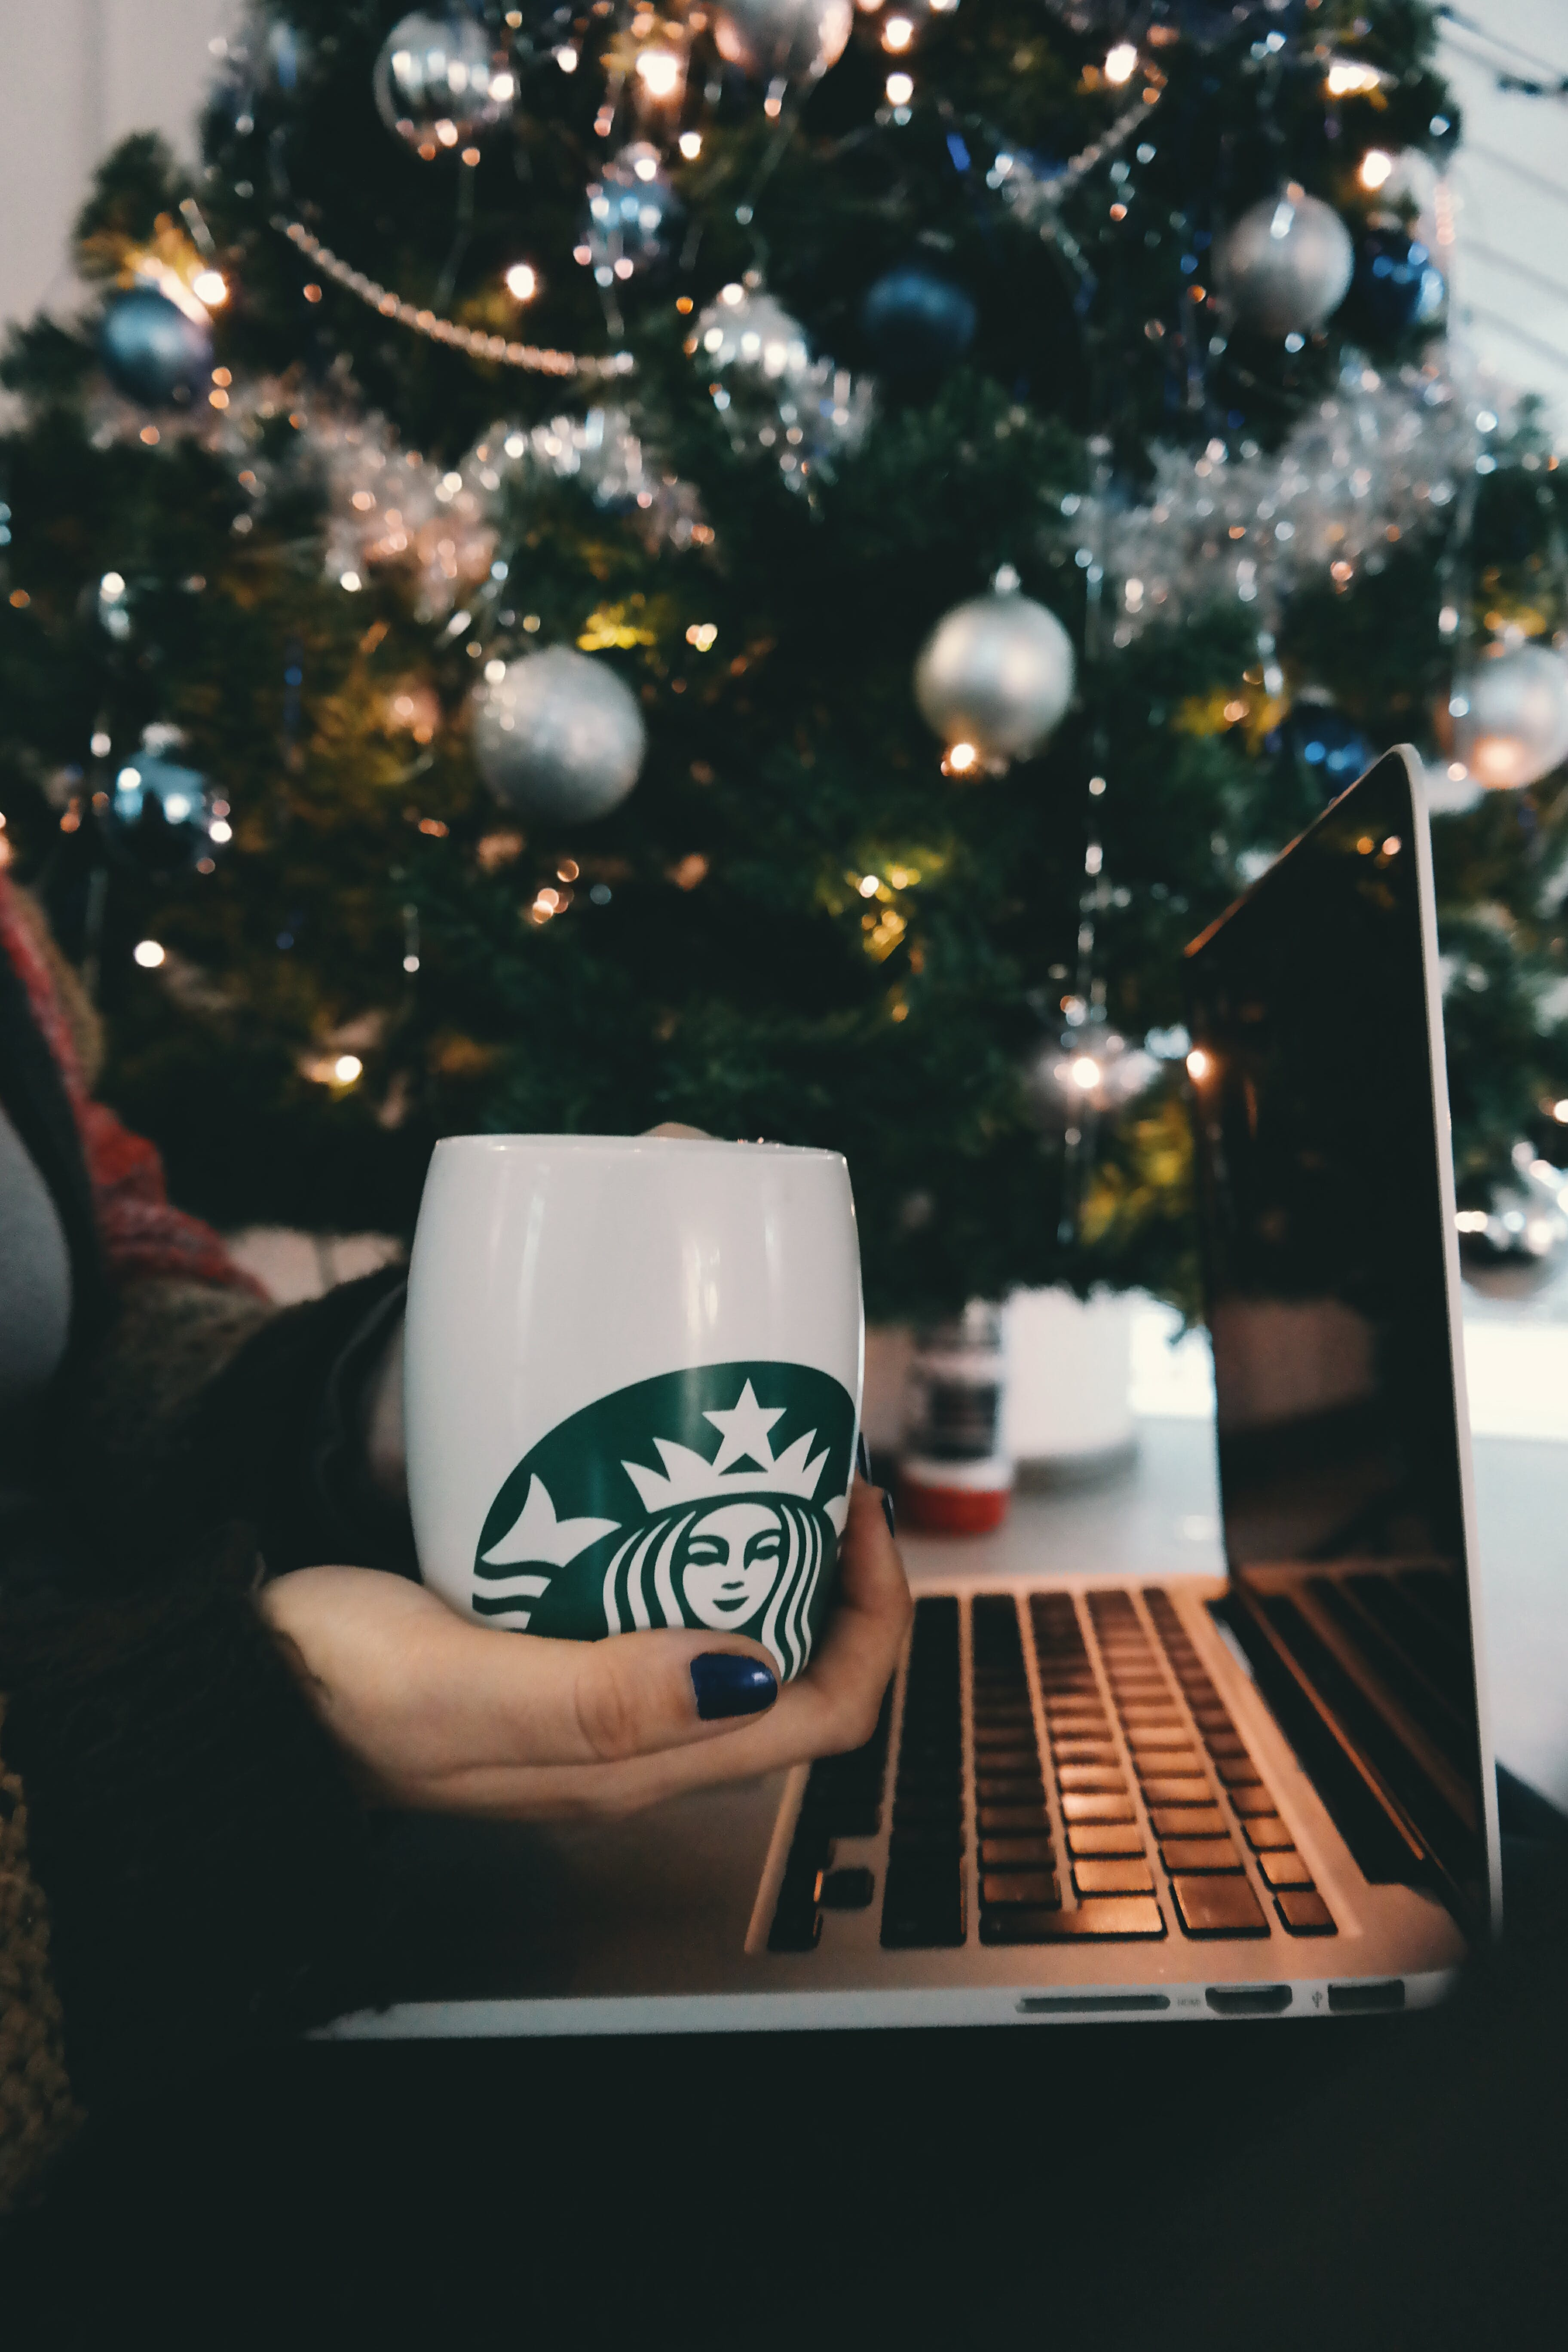 Person Holding Starbucks Mug